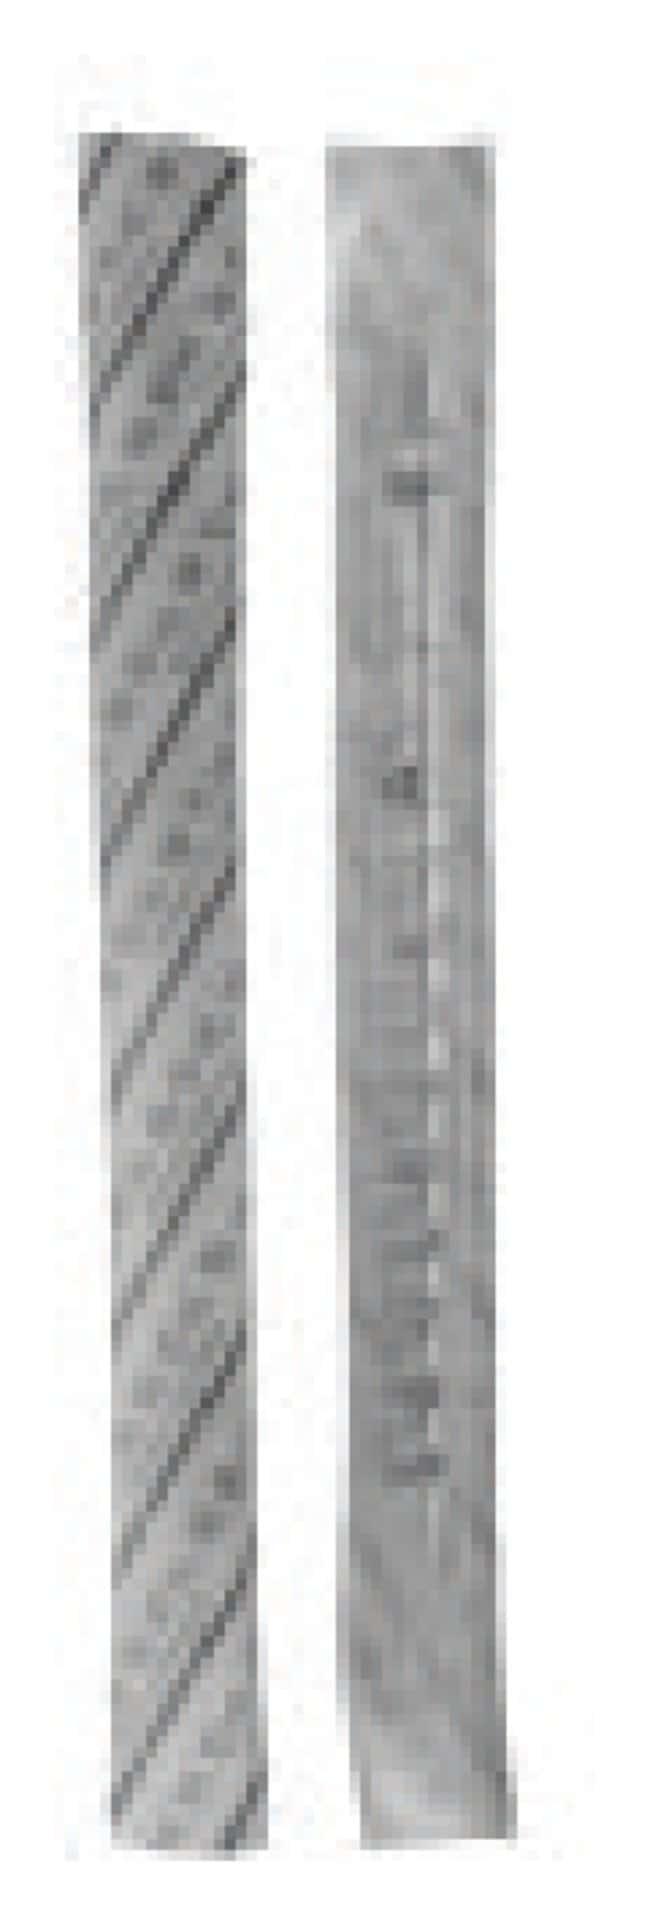 DWK Life Sciences Kimble Kontes Disposable Serological Pipets :Testing